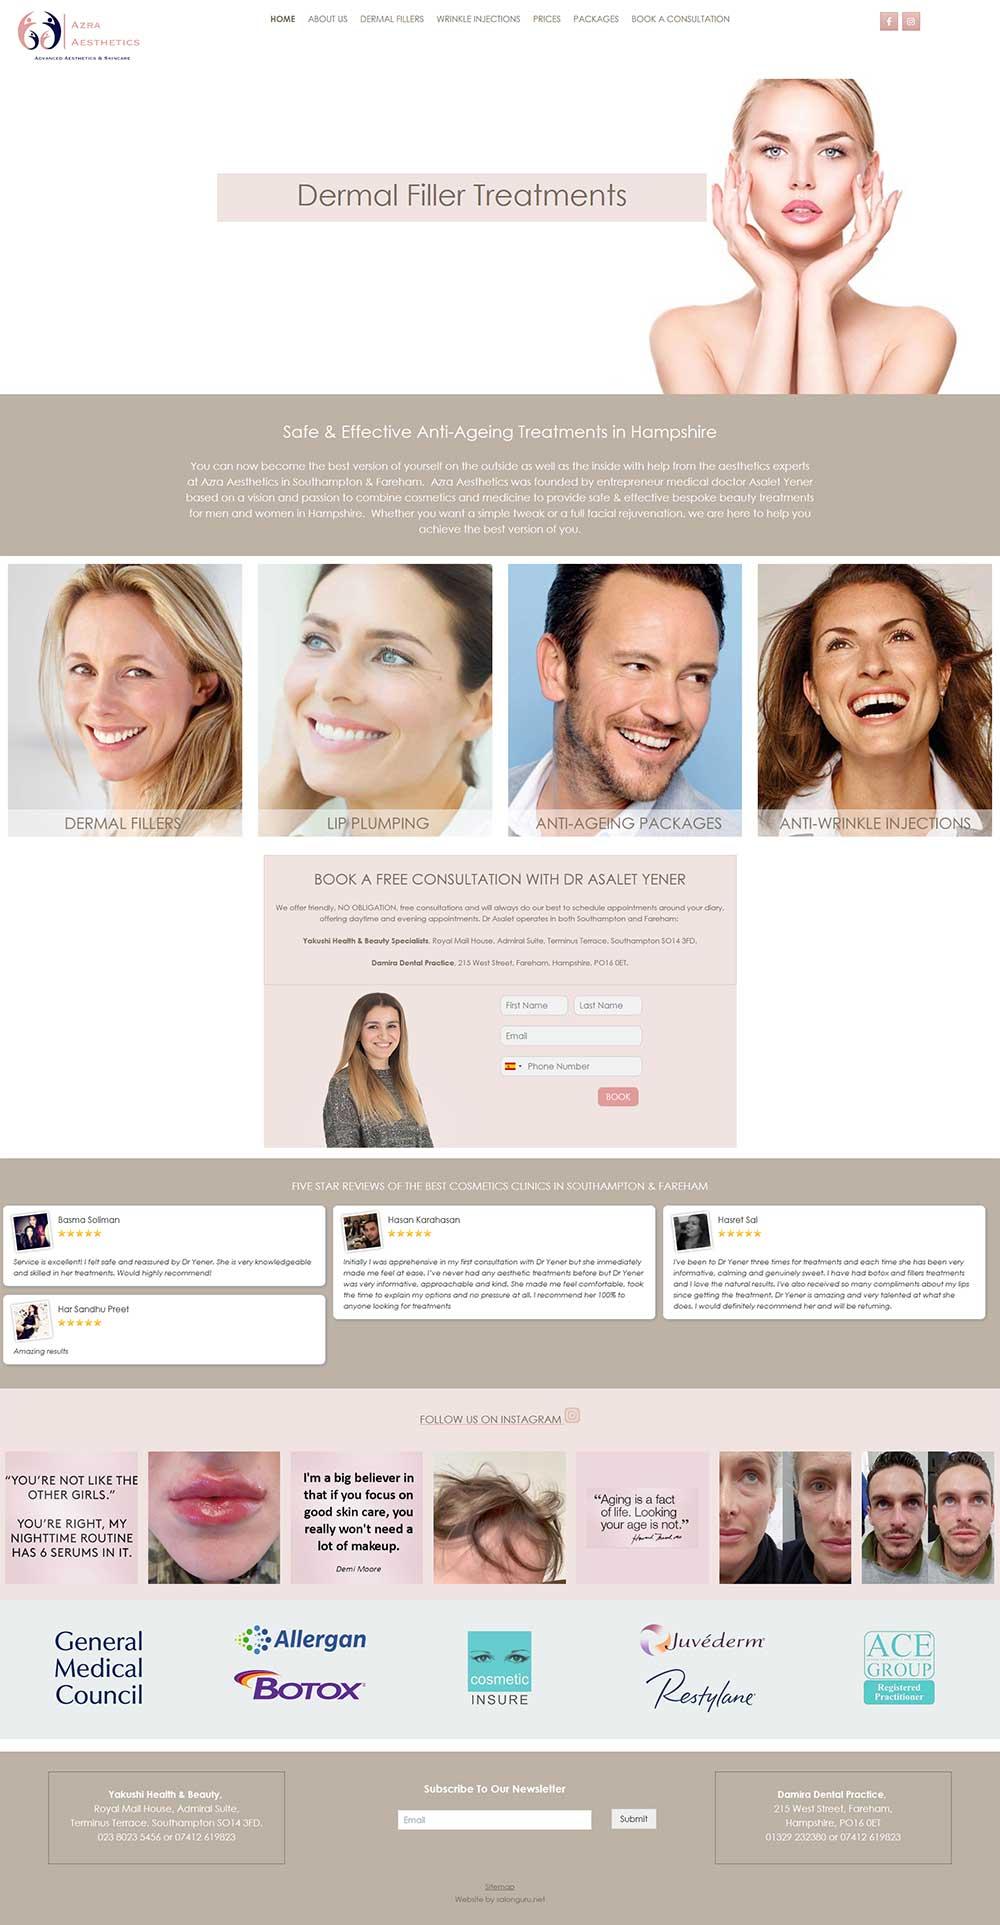 azra-aesthetics website